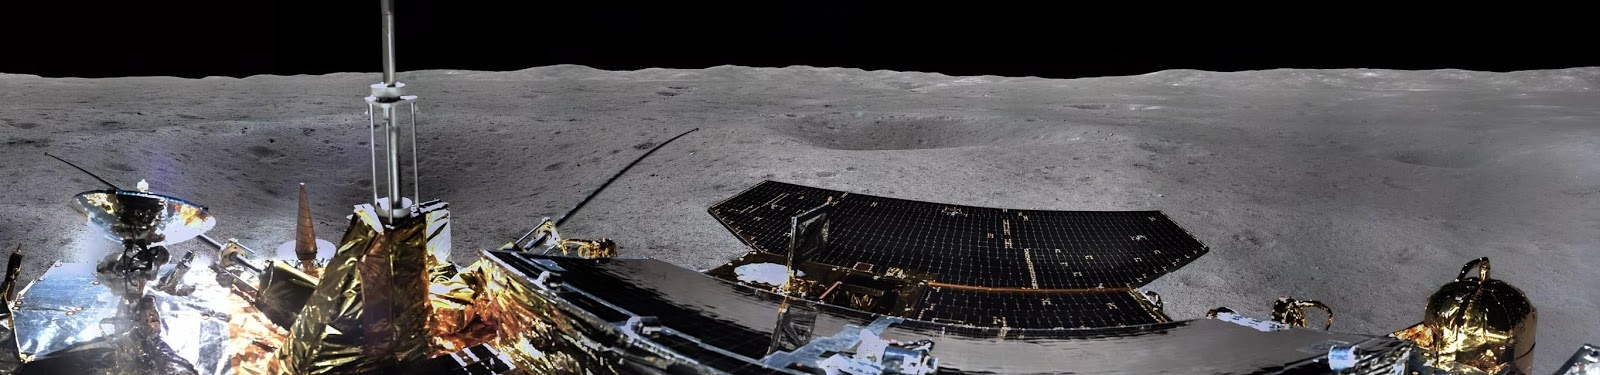 foto-panoramica-lado-oculto-luna